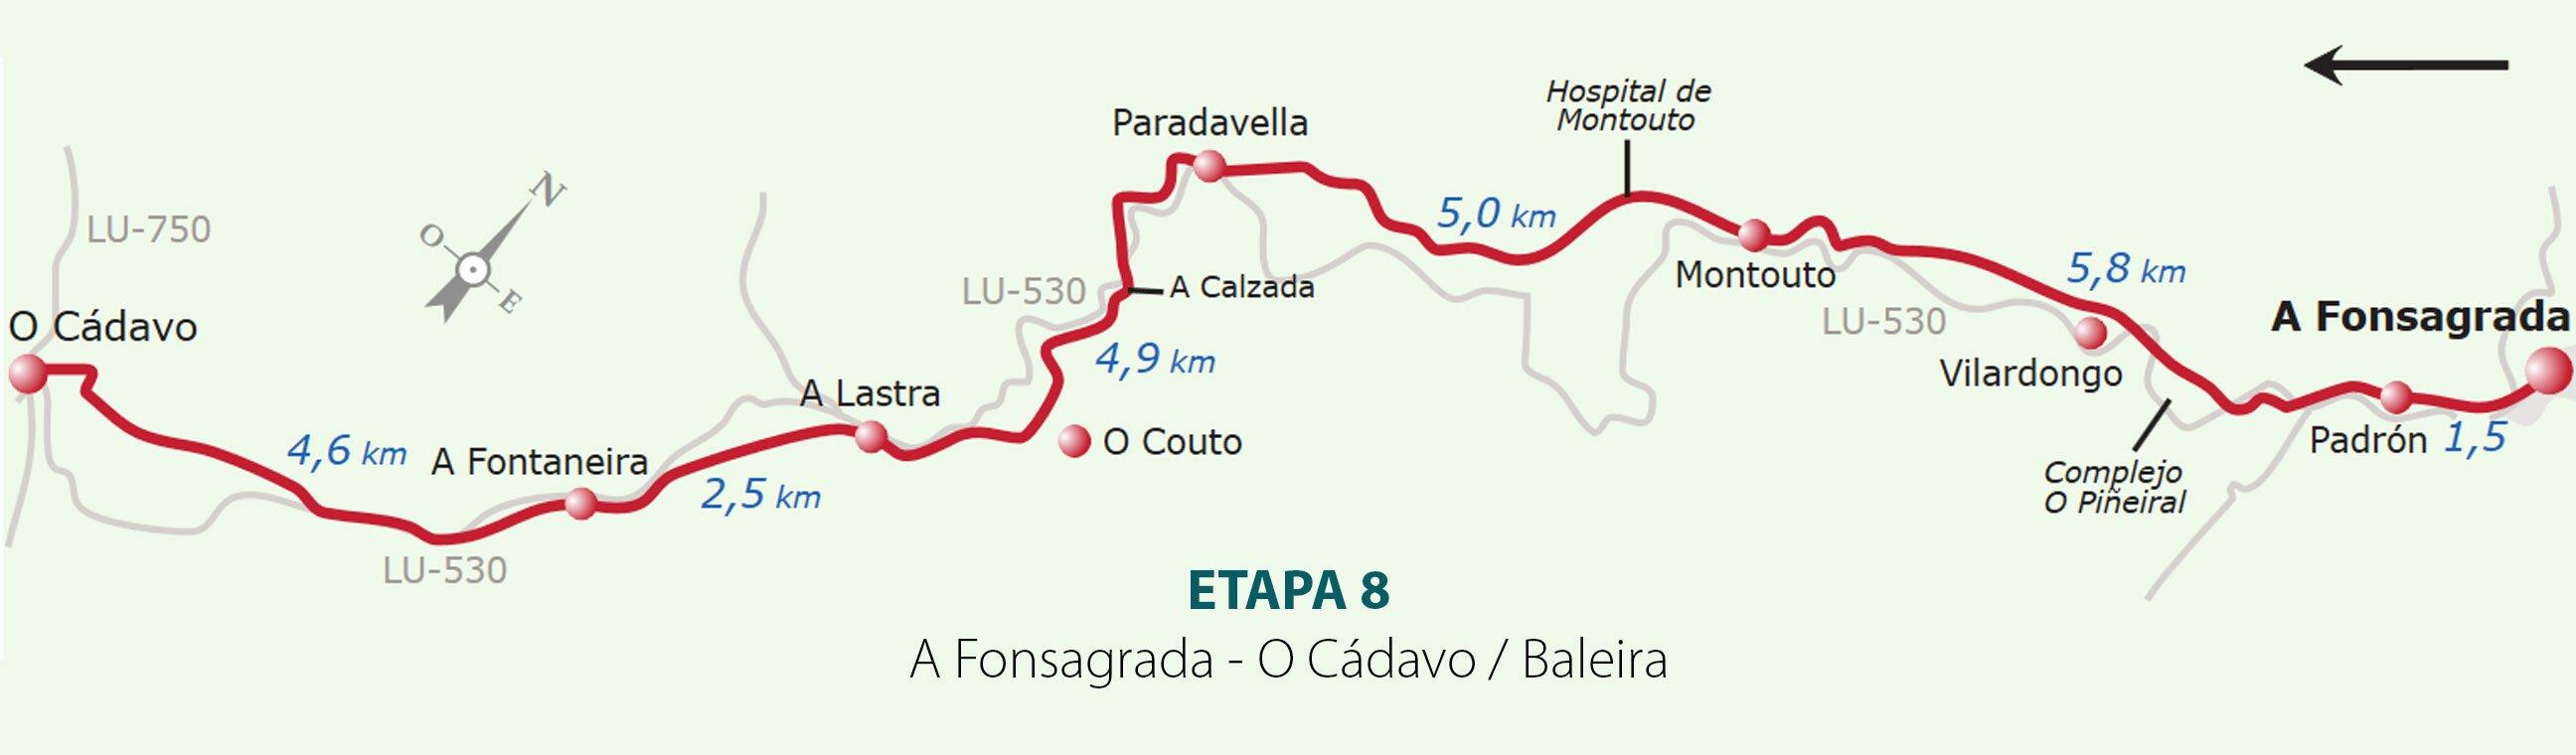 mapa-camino-fonsagrada-baleira